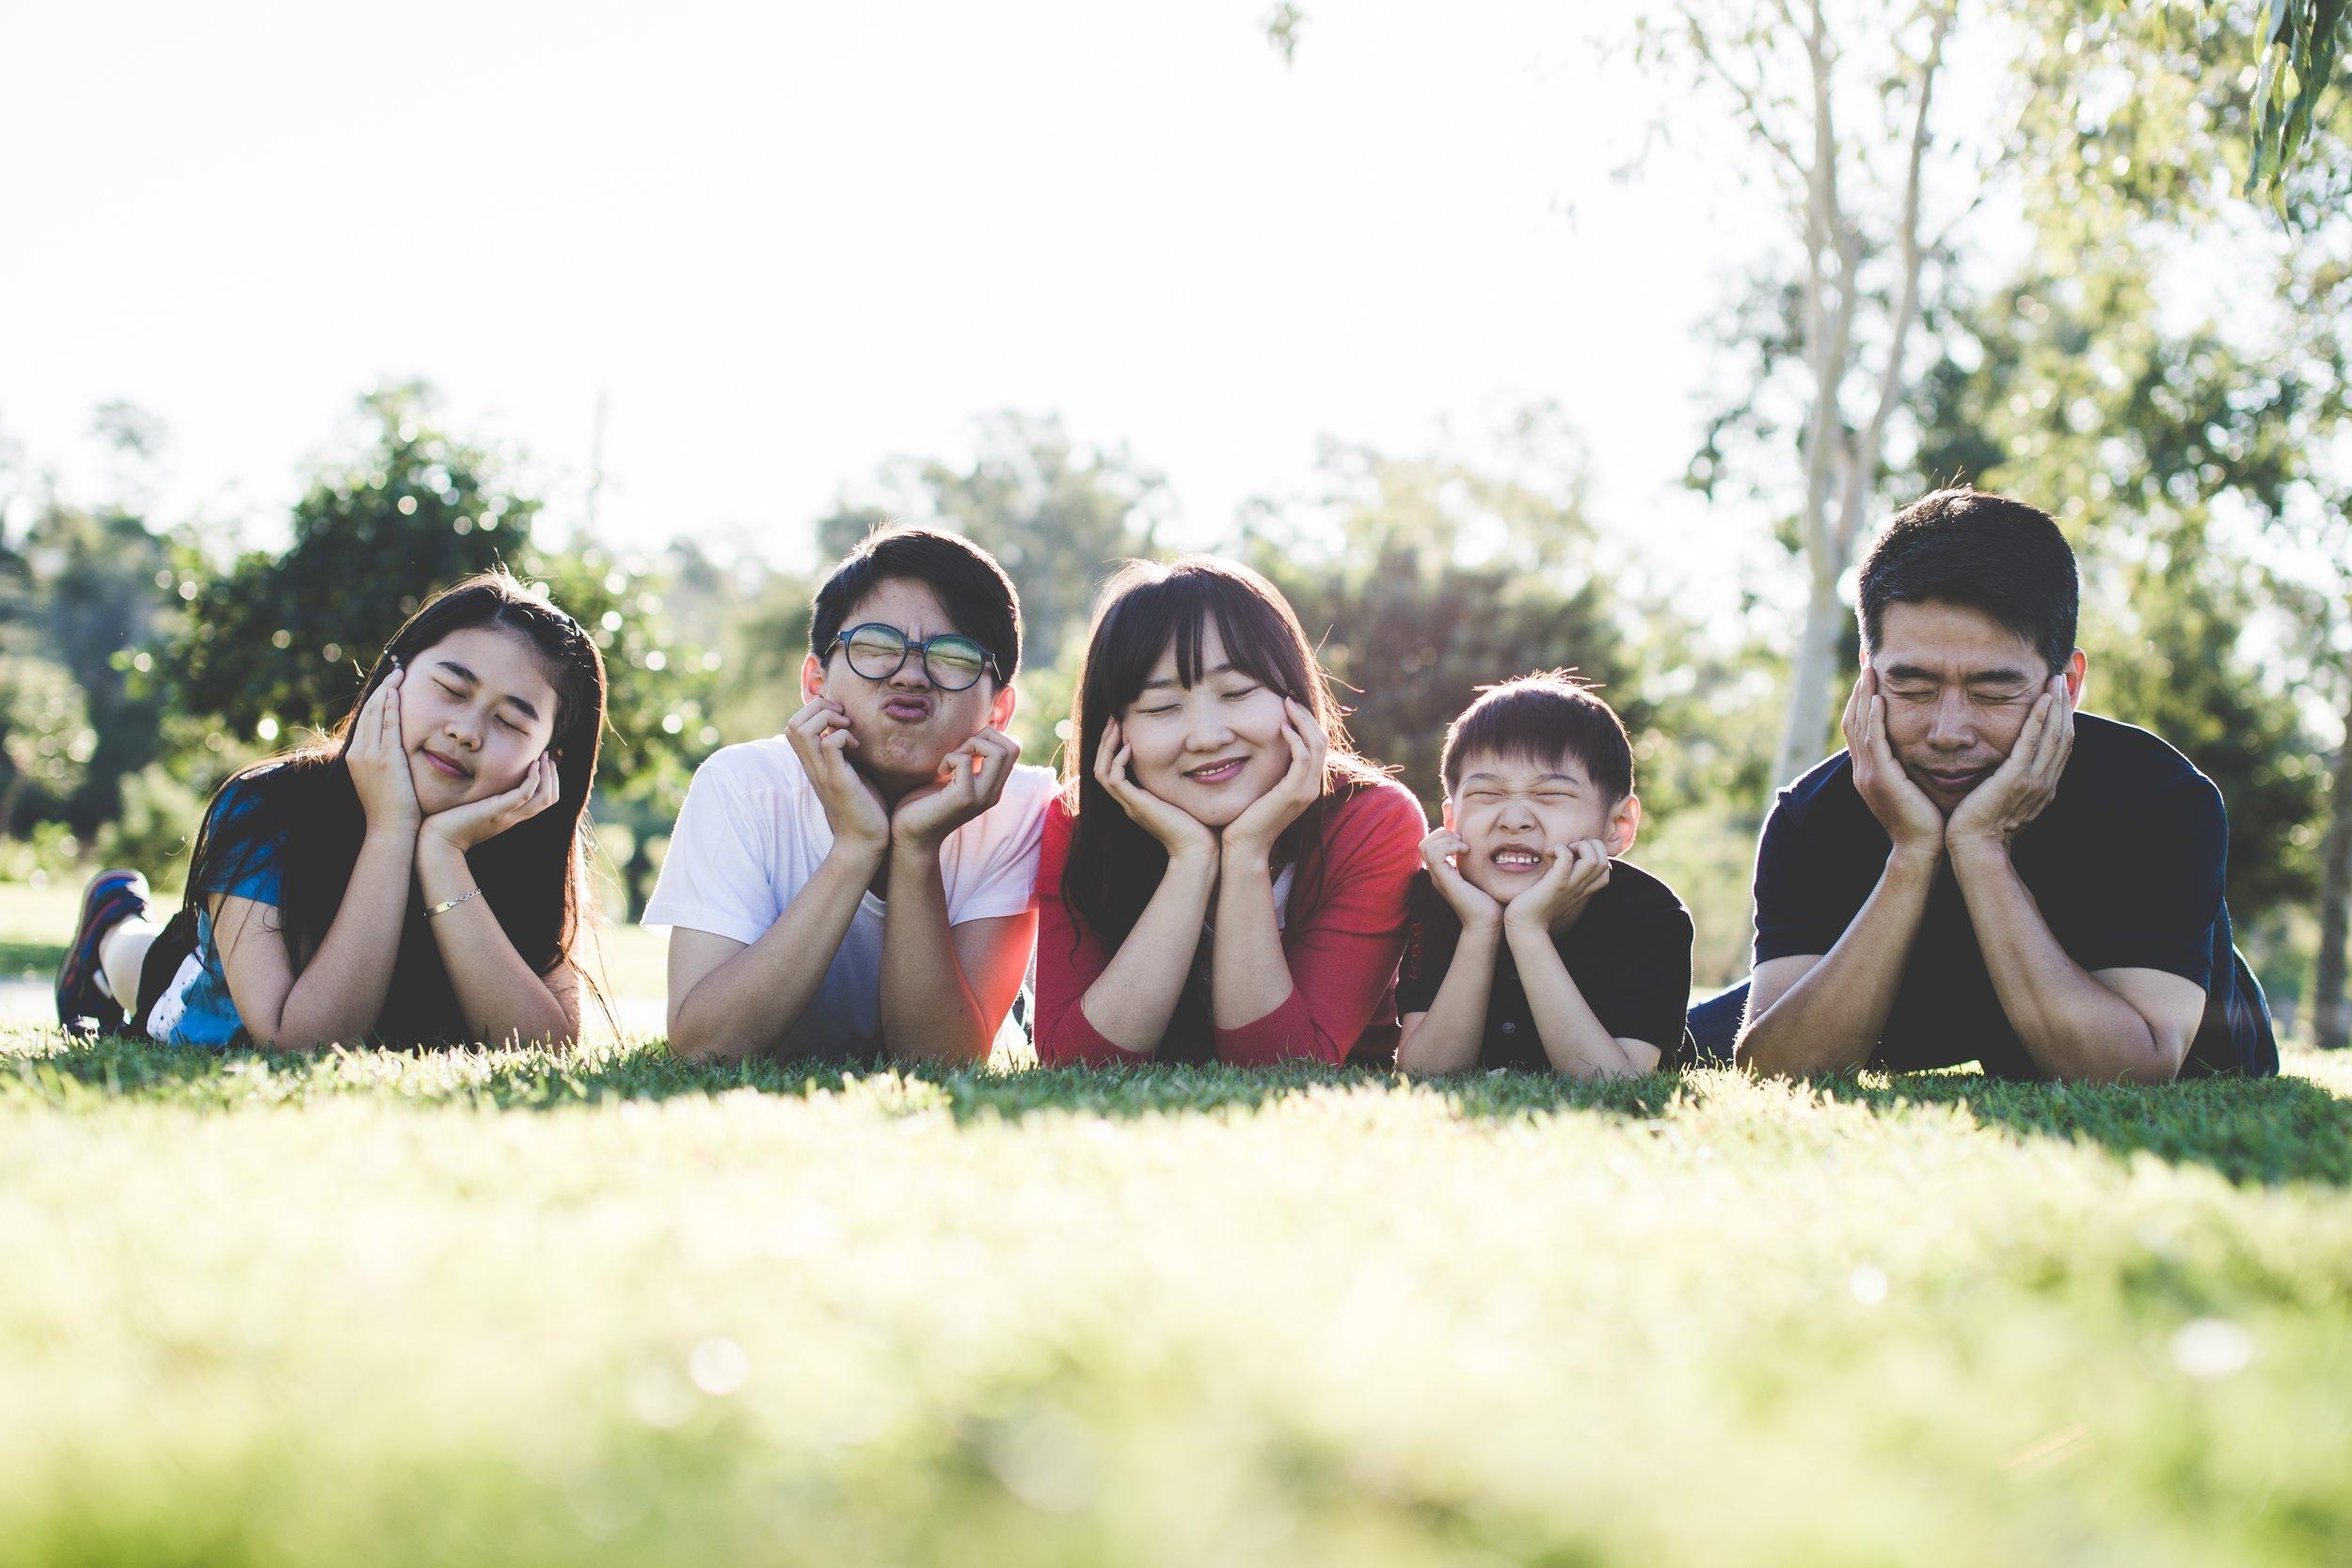 family-outdoor-happy-happiness-160994.jpeg